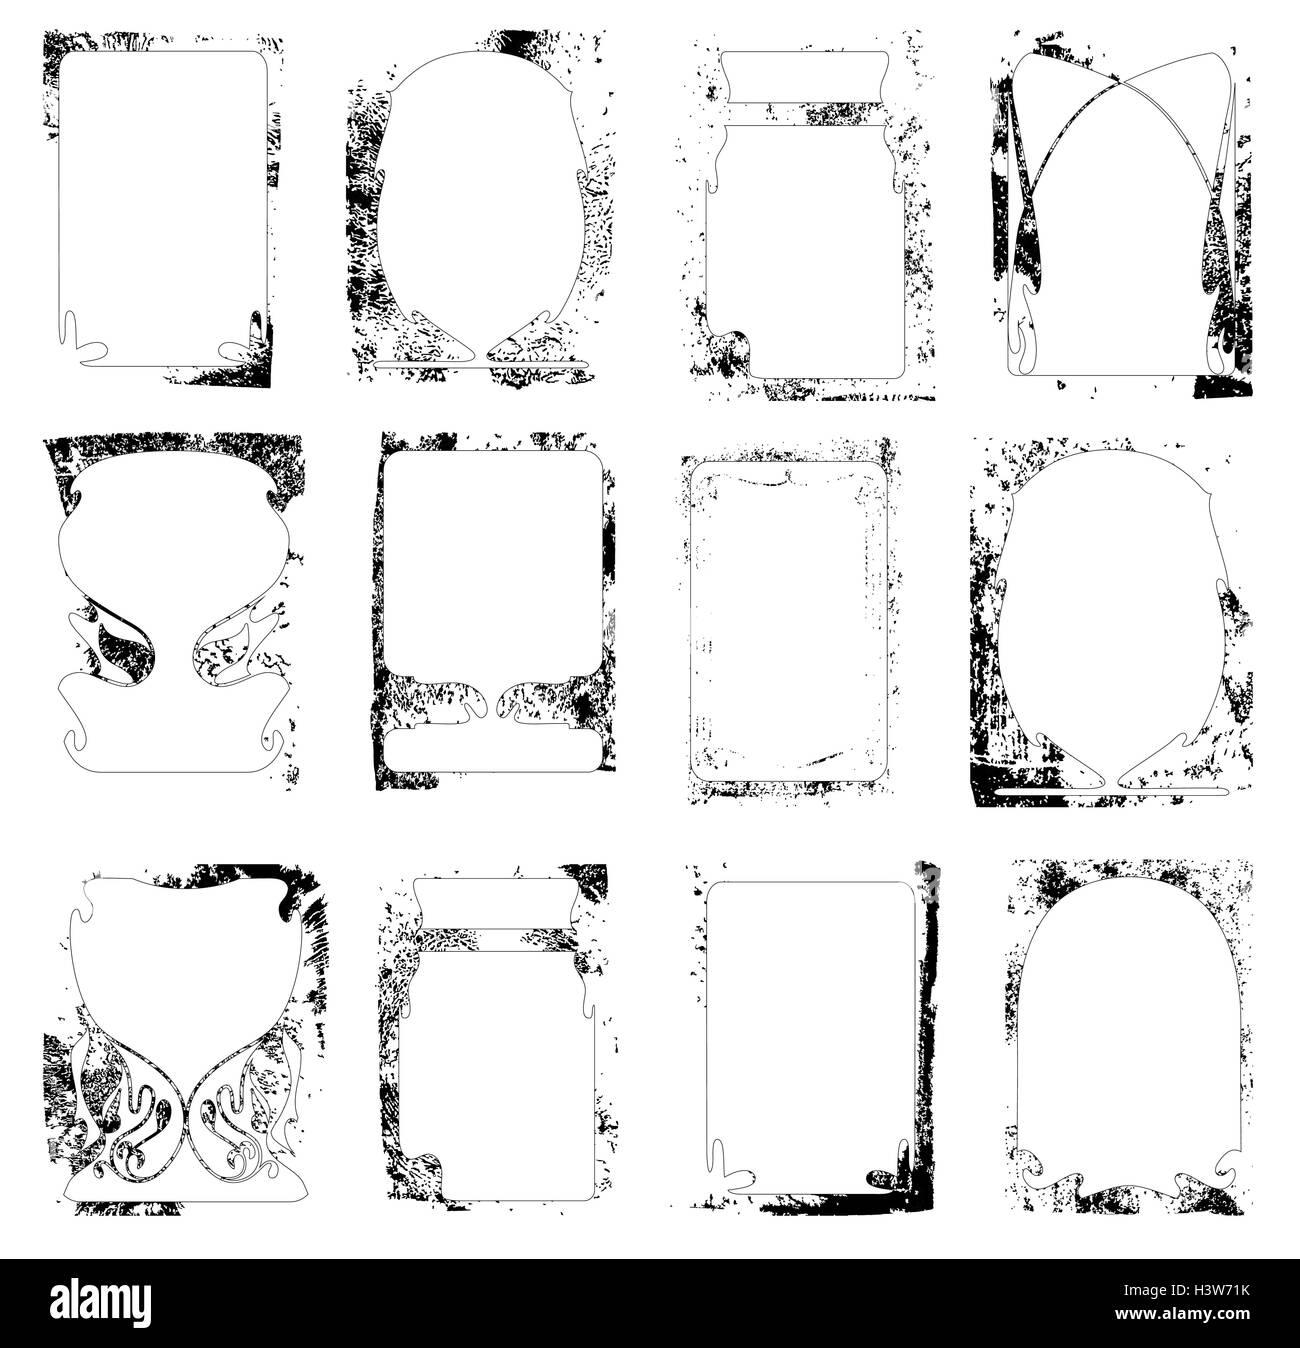 Tolle Vektor Rahmen Galerie - Benutzerdefinierte Bilderrahmen Ideen ...